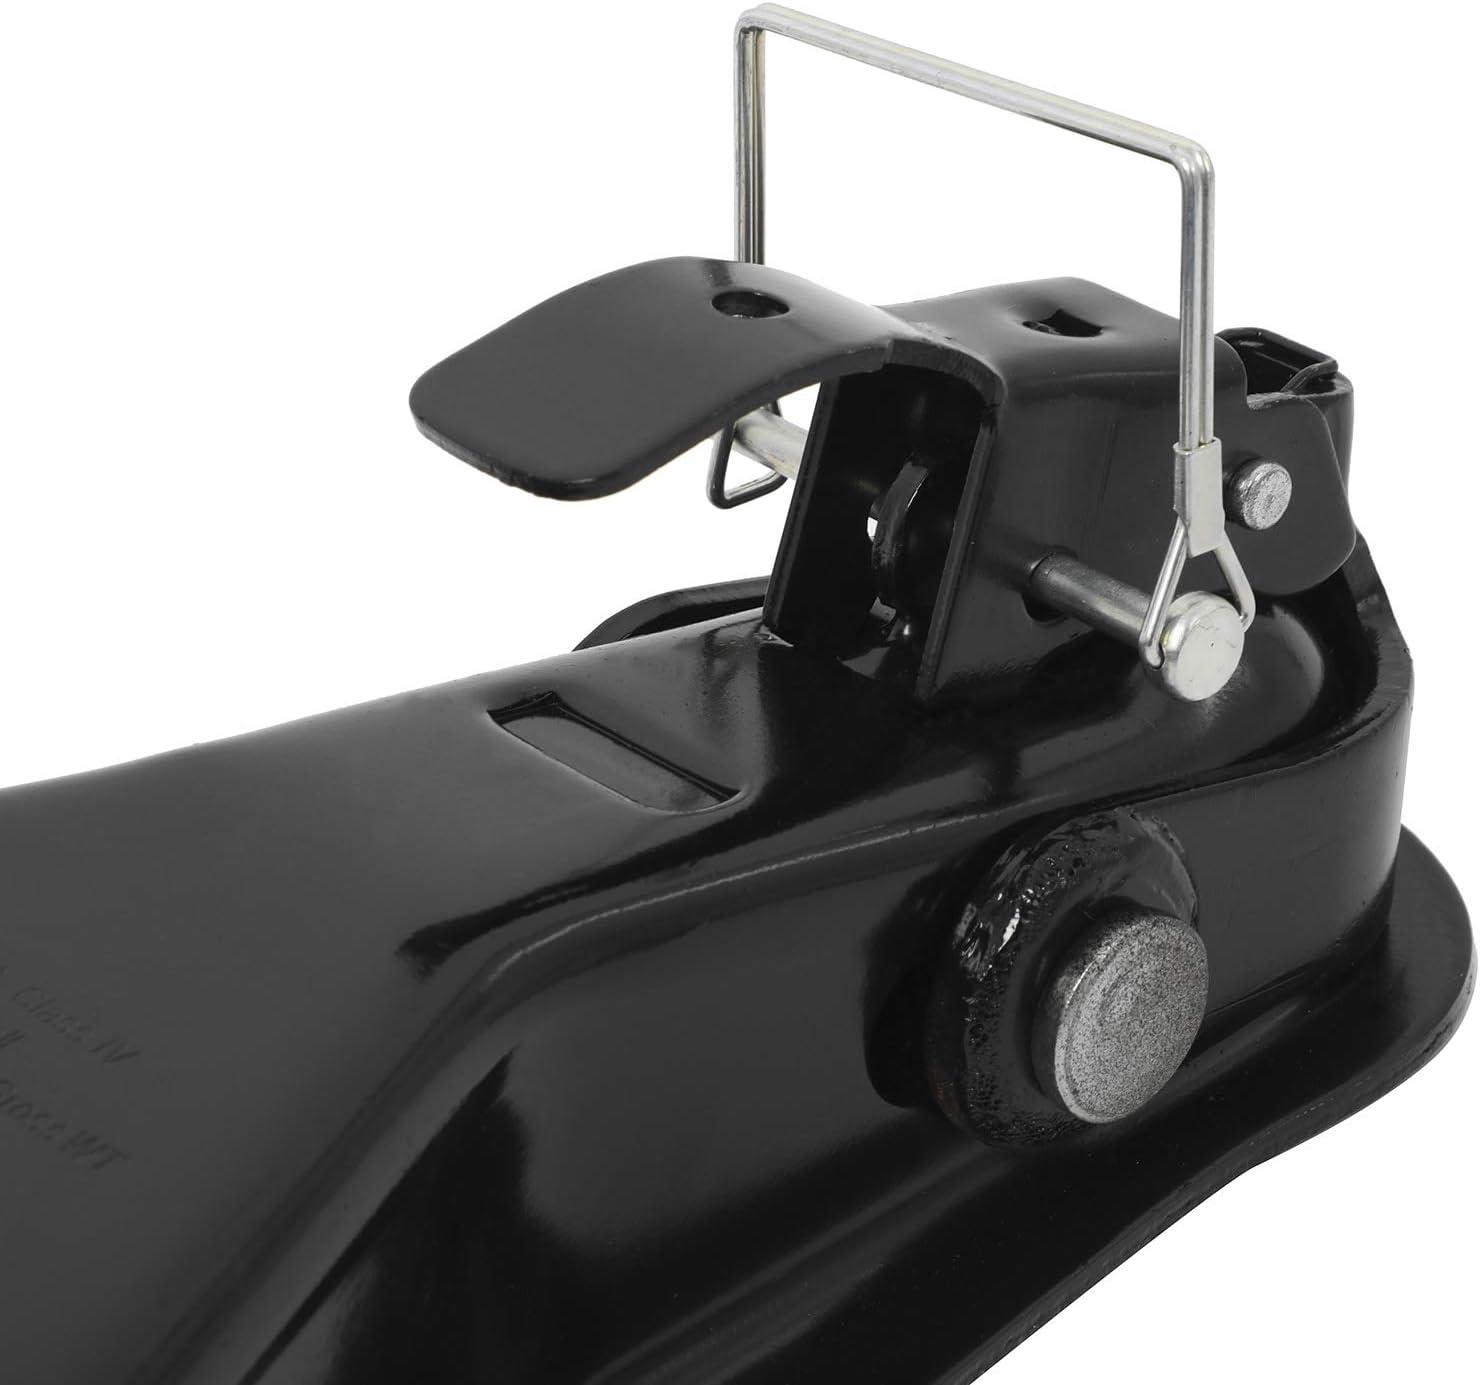 NovelBee 2 Ball Class IV A-Frame Trailer Coupler with Yoke Latch,8000LBS Capacity